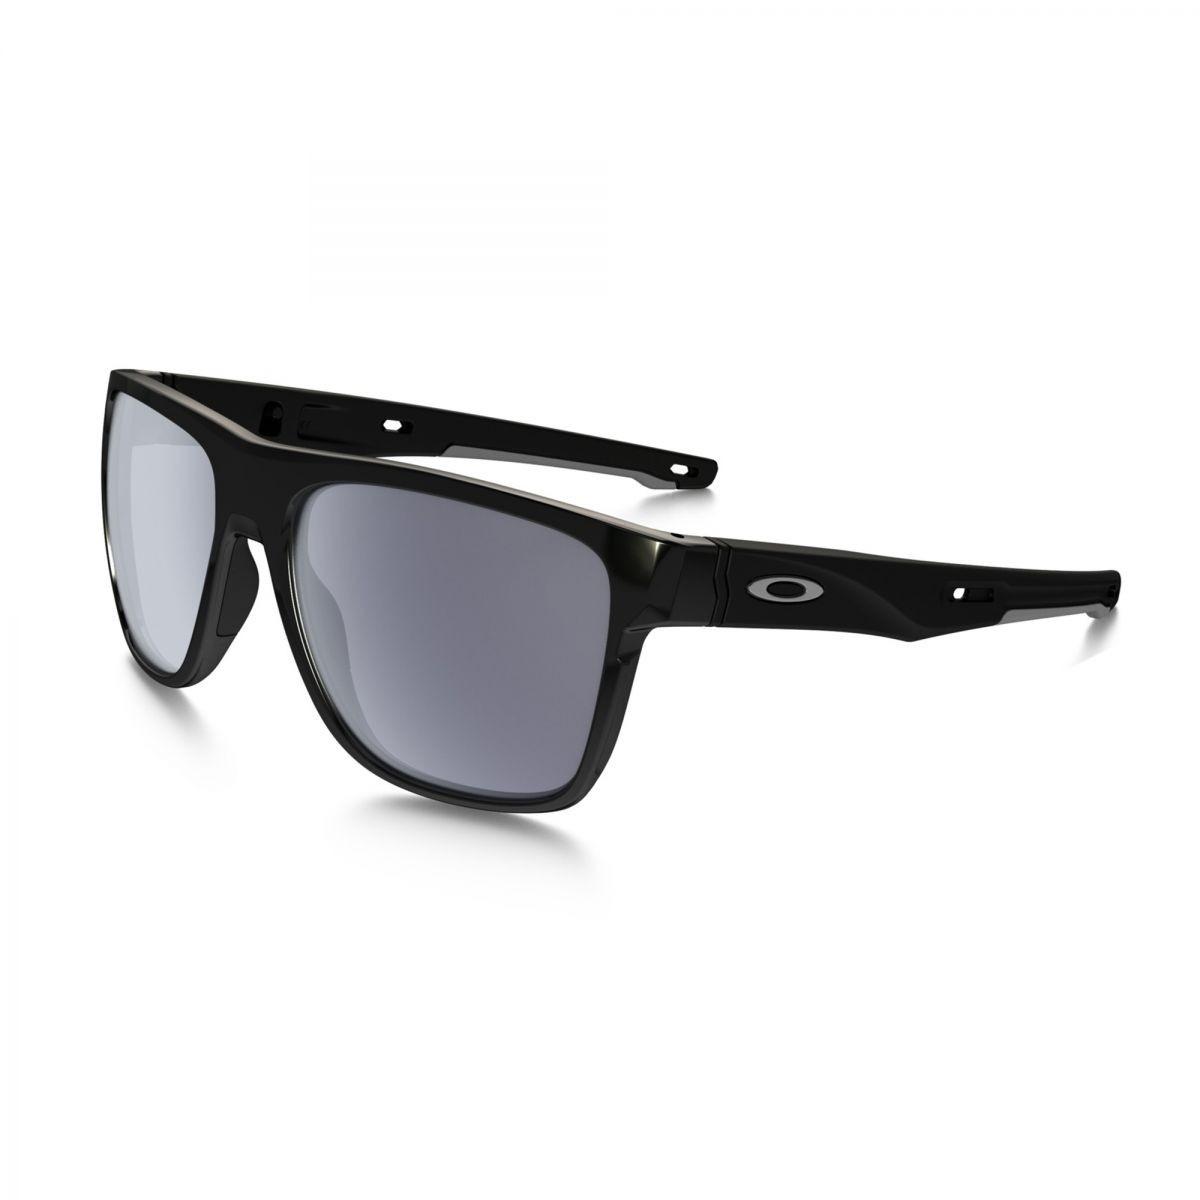 e77a4a455959e óculos de sol oakley oo9360-01 crossrange xl l1. Carregando zoom.